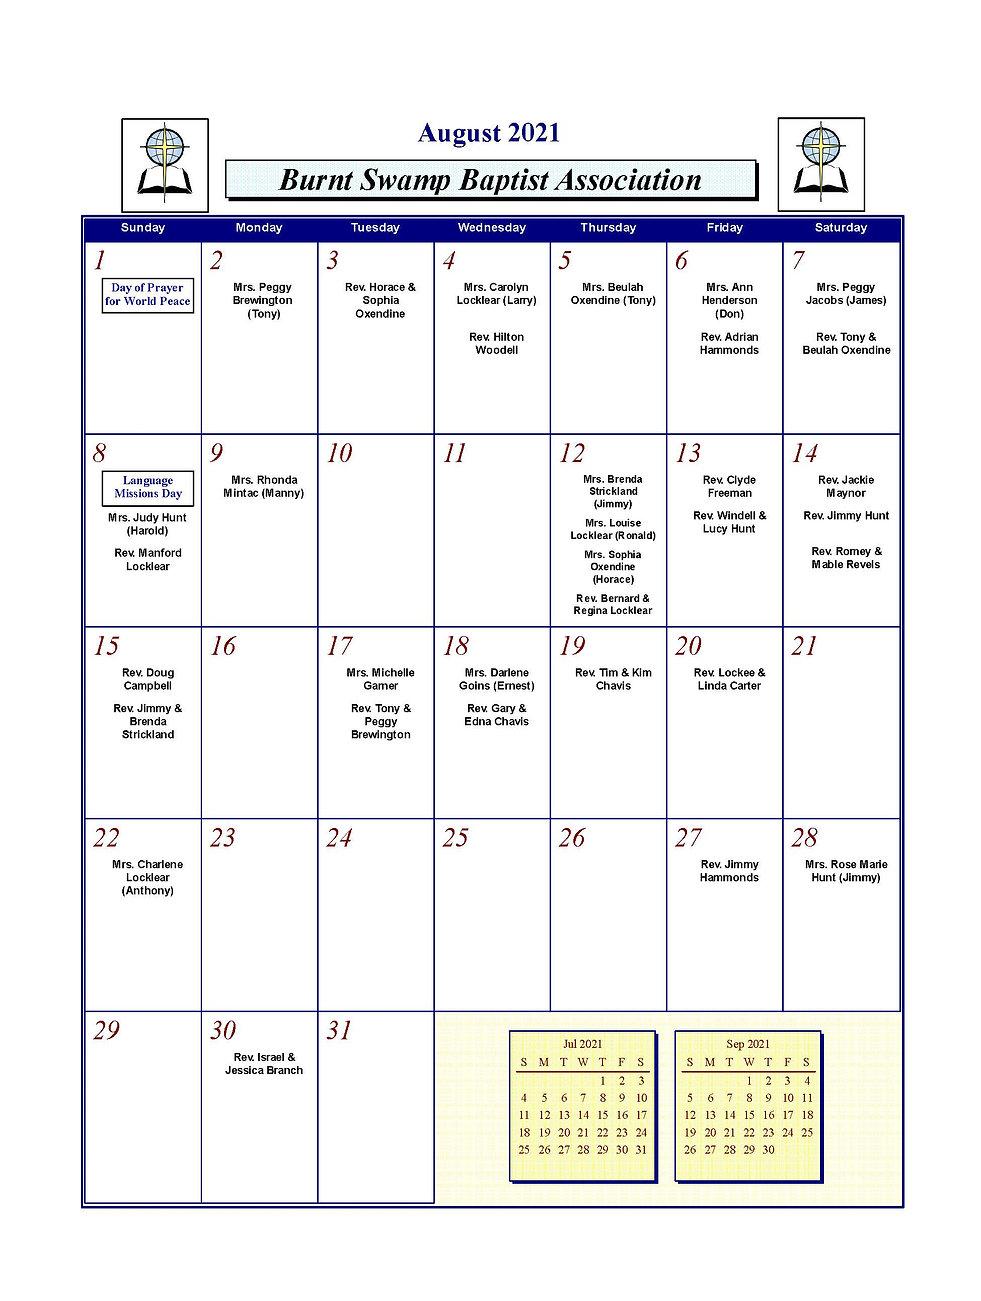 CalendarAugust2021.jpg